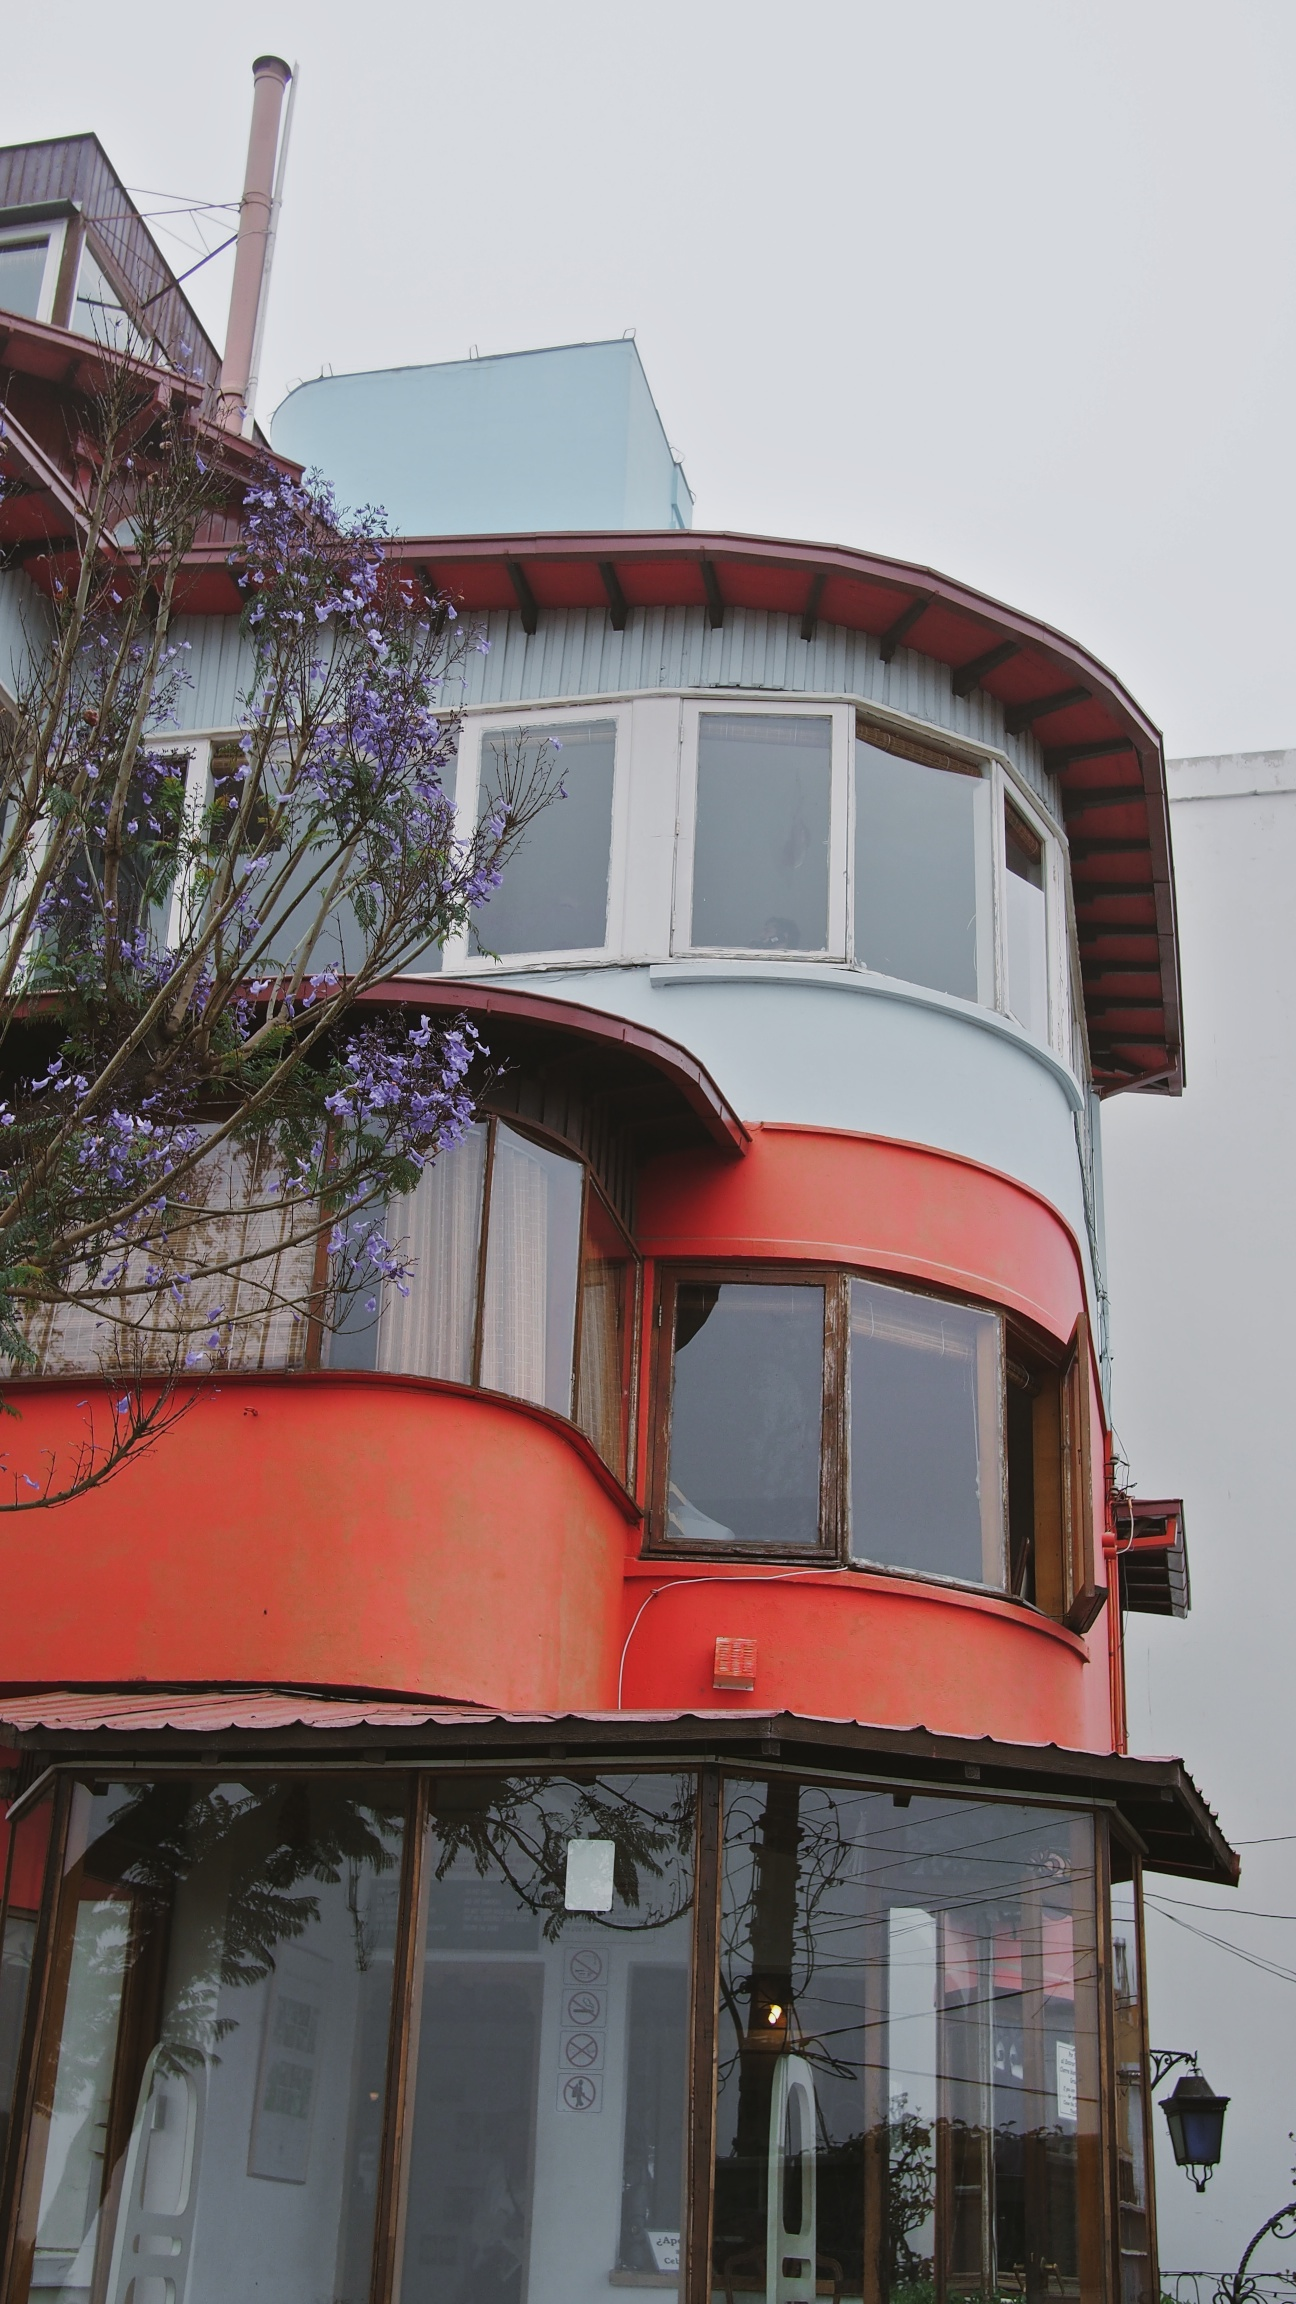 Pablo Neruda's house in Valparaíso, La Sebastiana